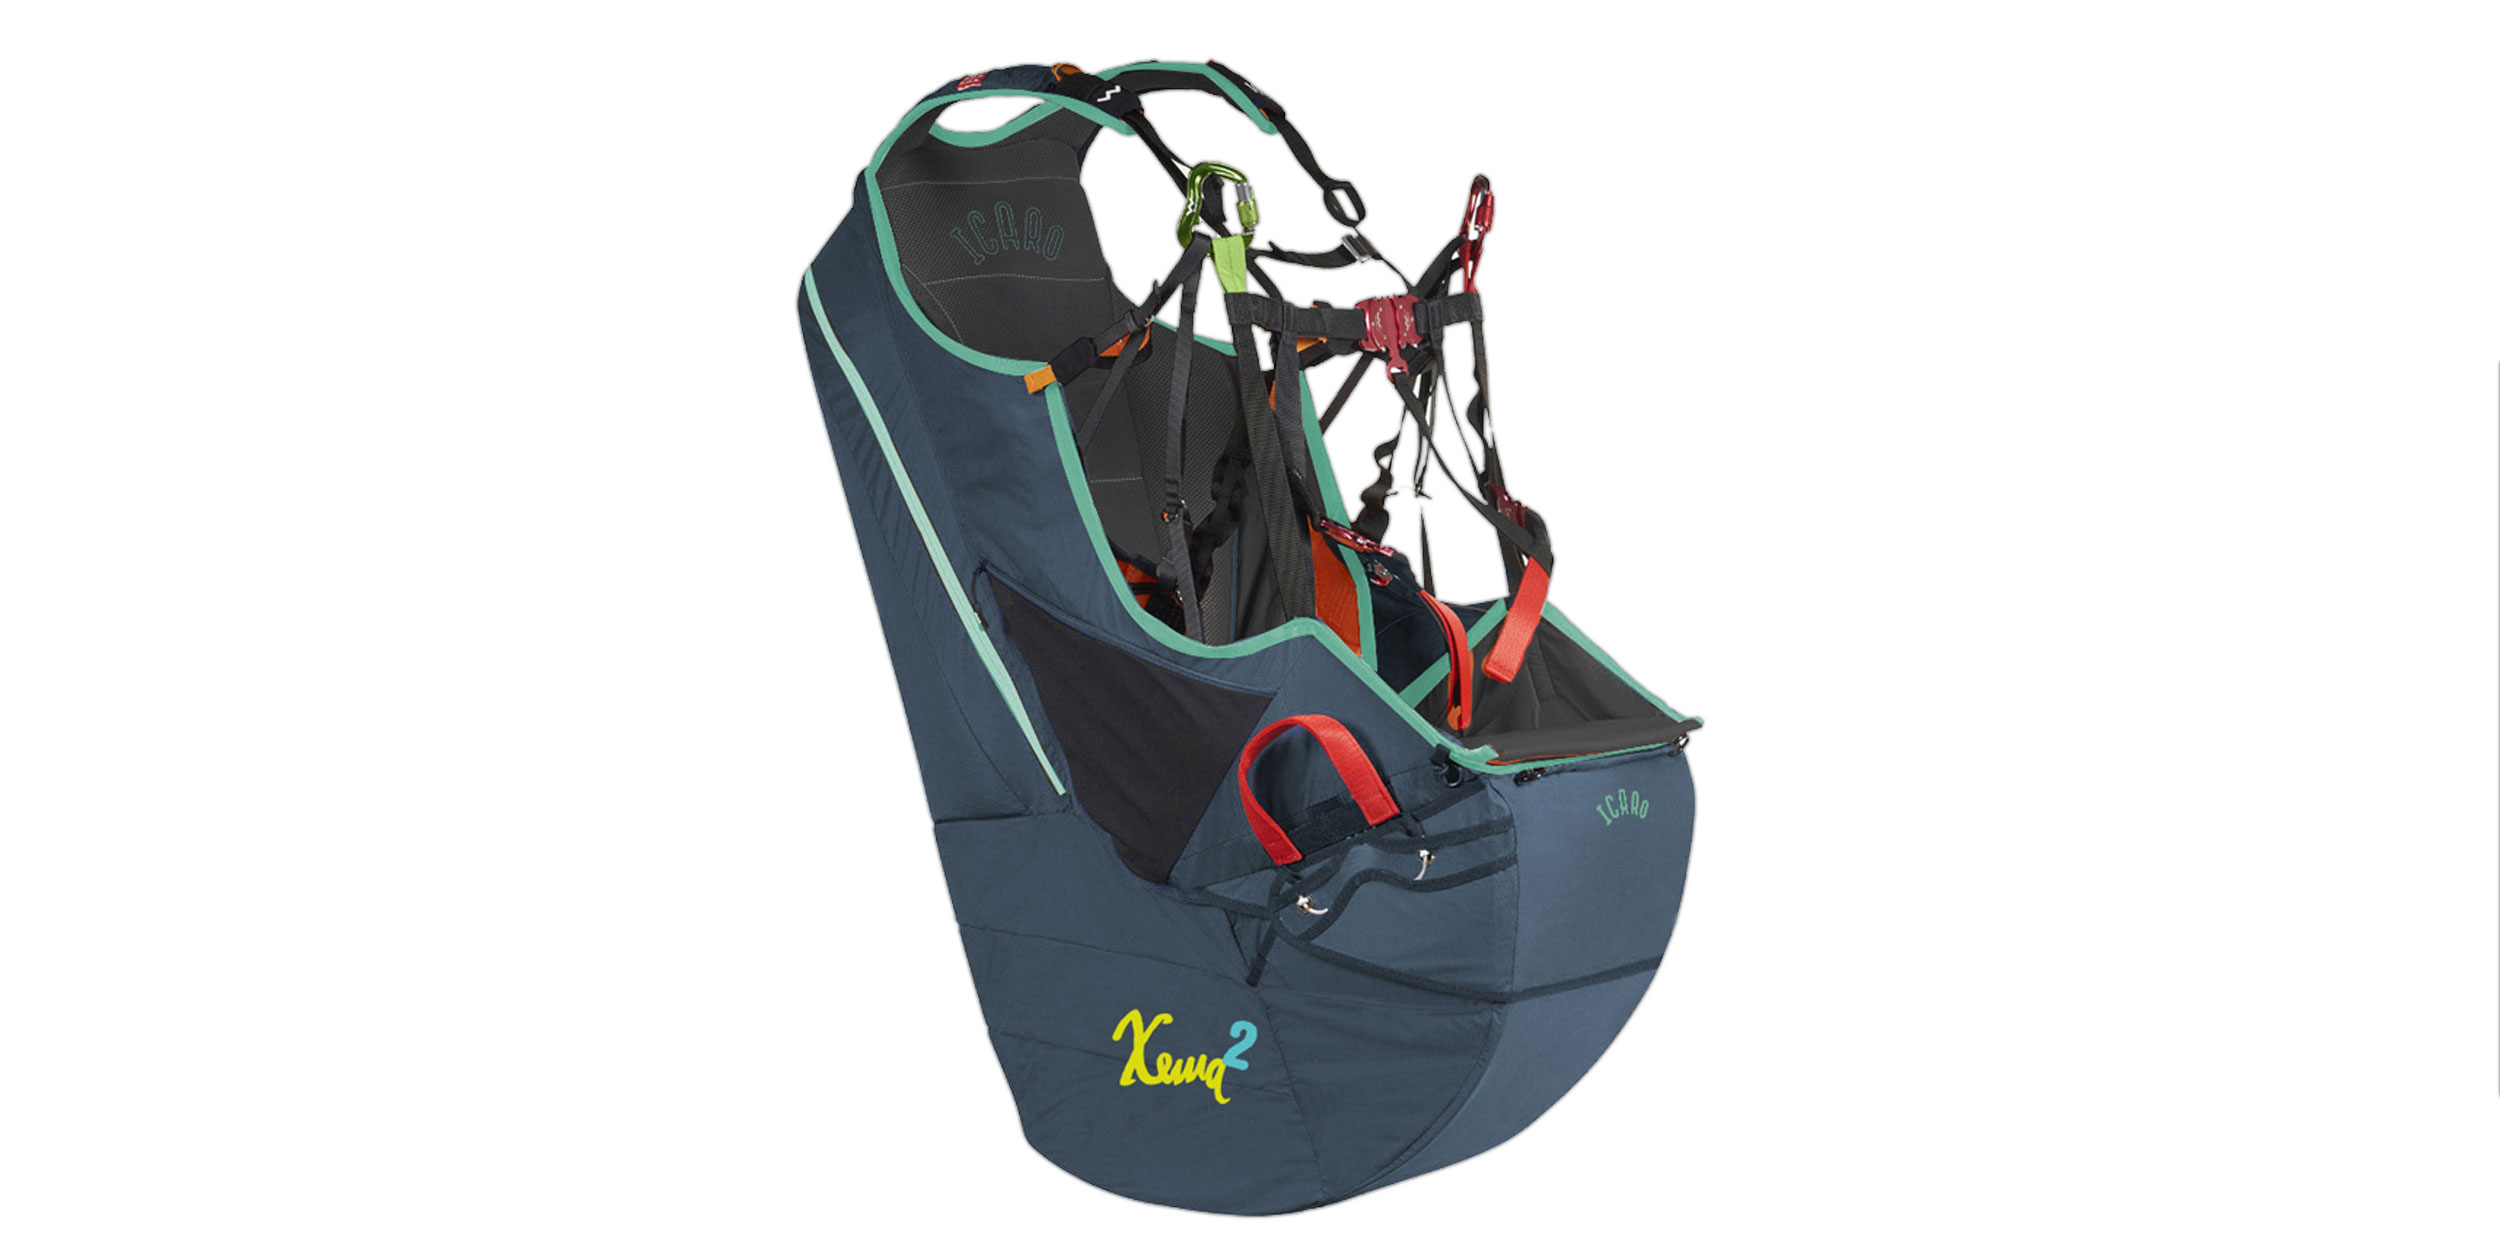 Icaro Xema 2 harness